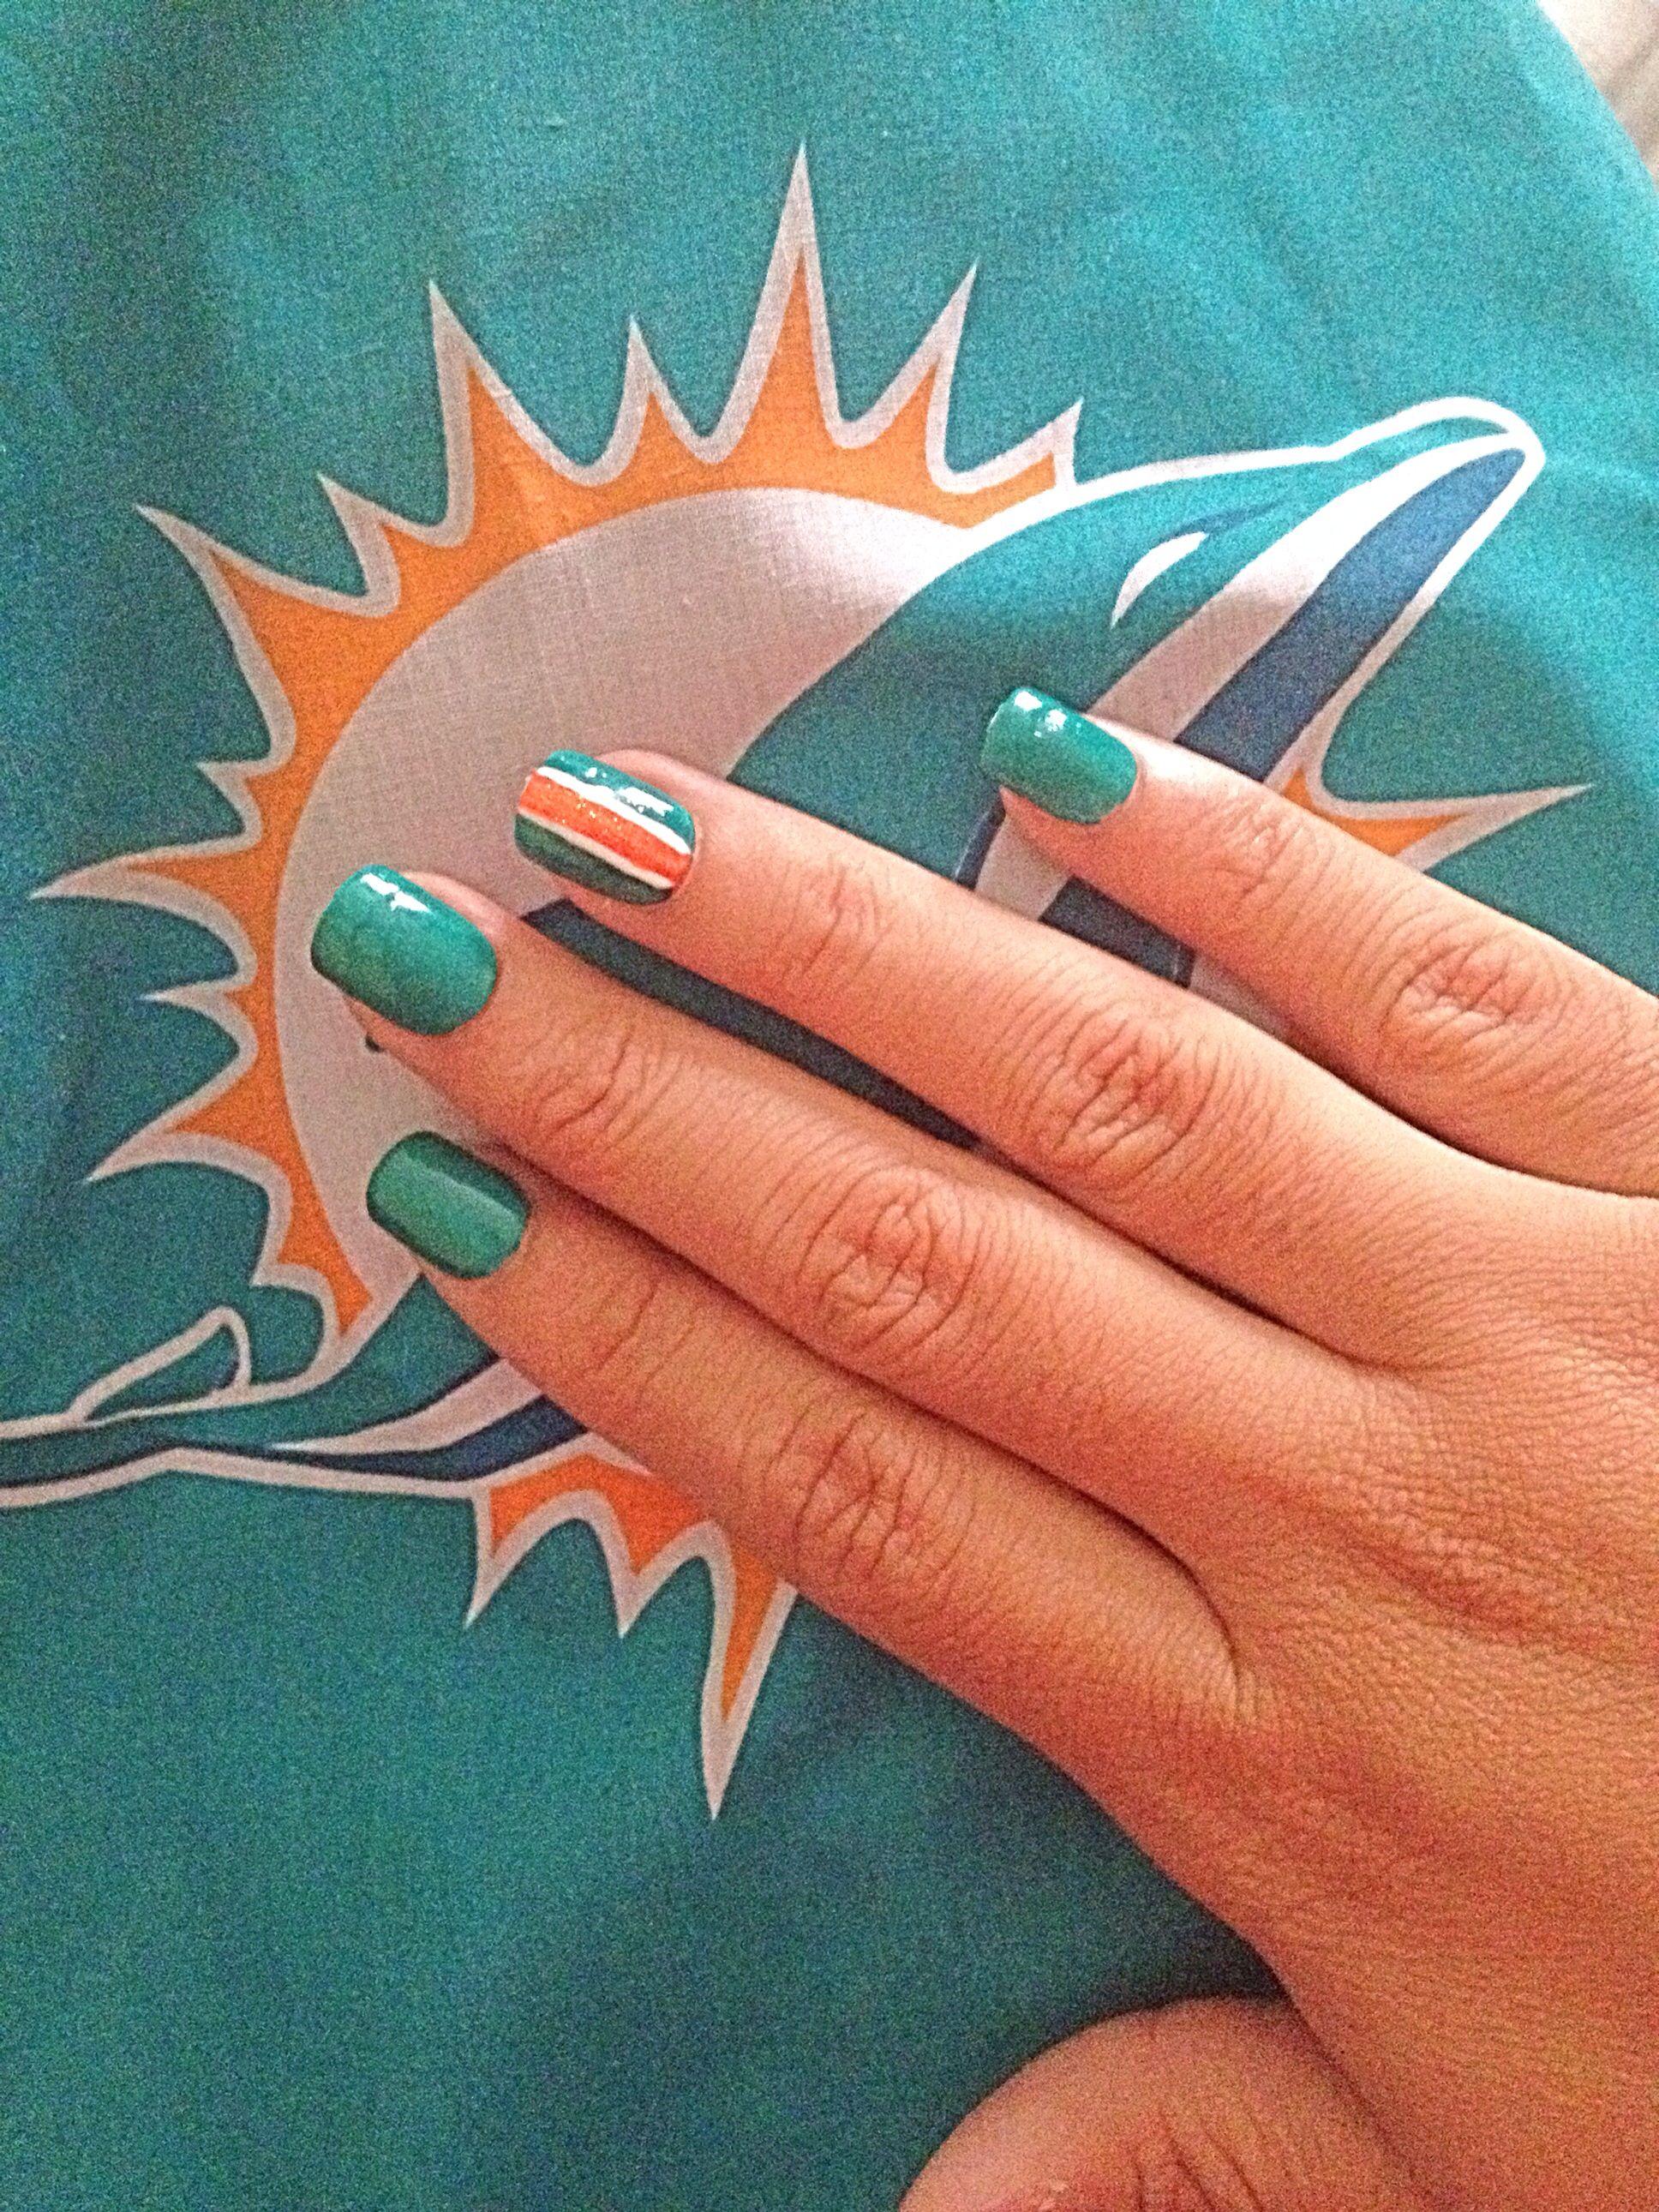 Miami Dolphins inspired nails | Nails | Pinterest | Miami, Makeup ...